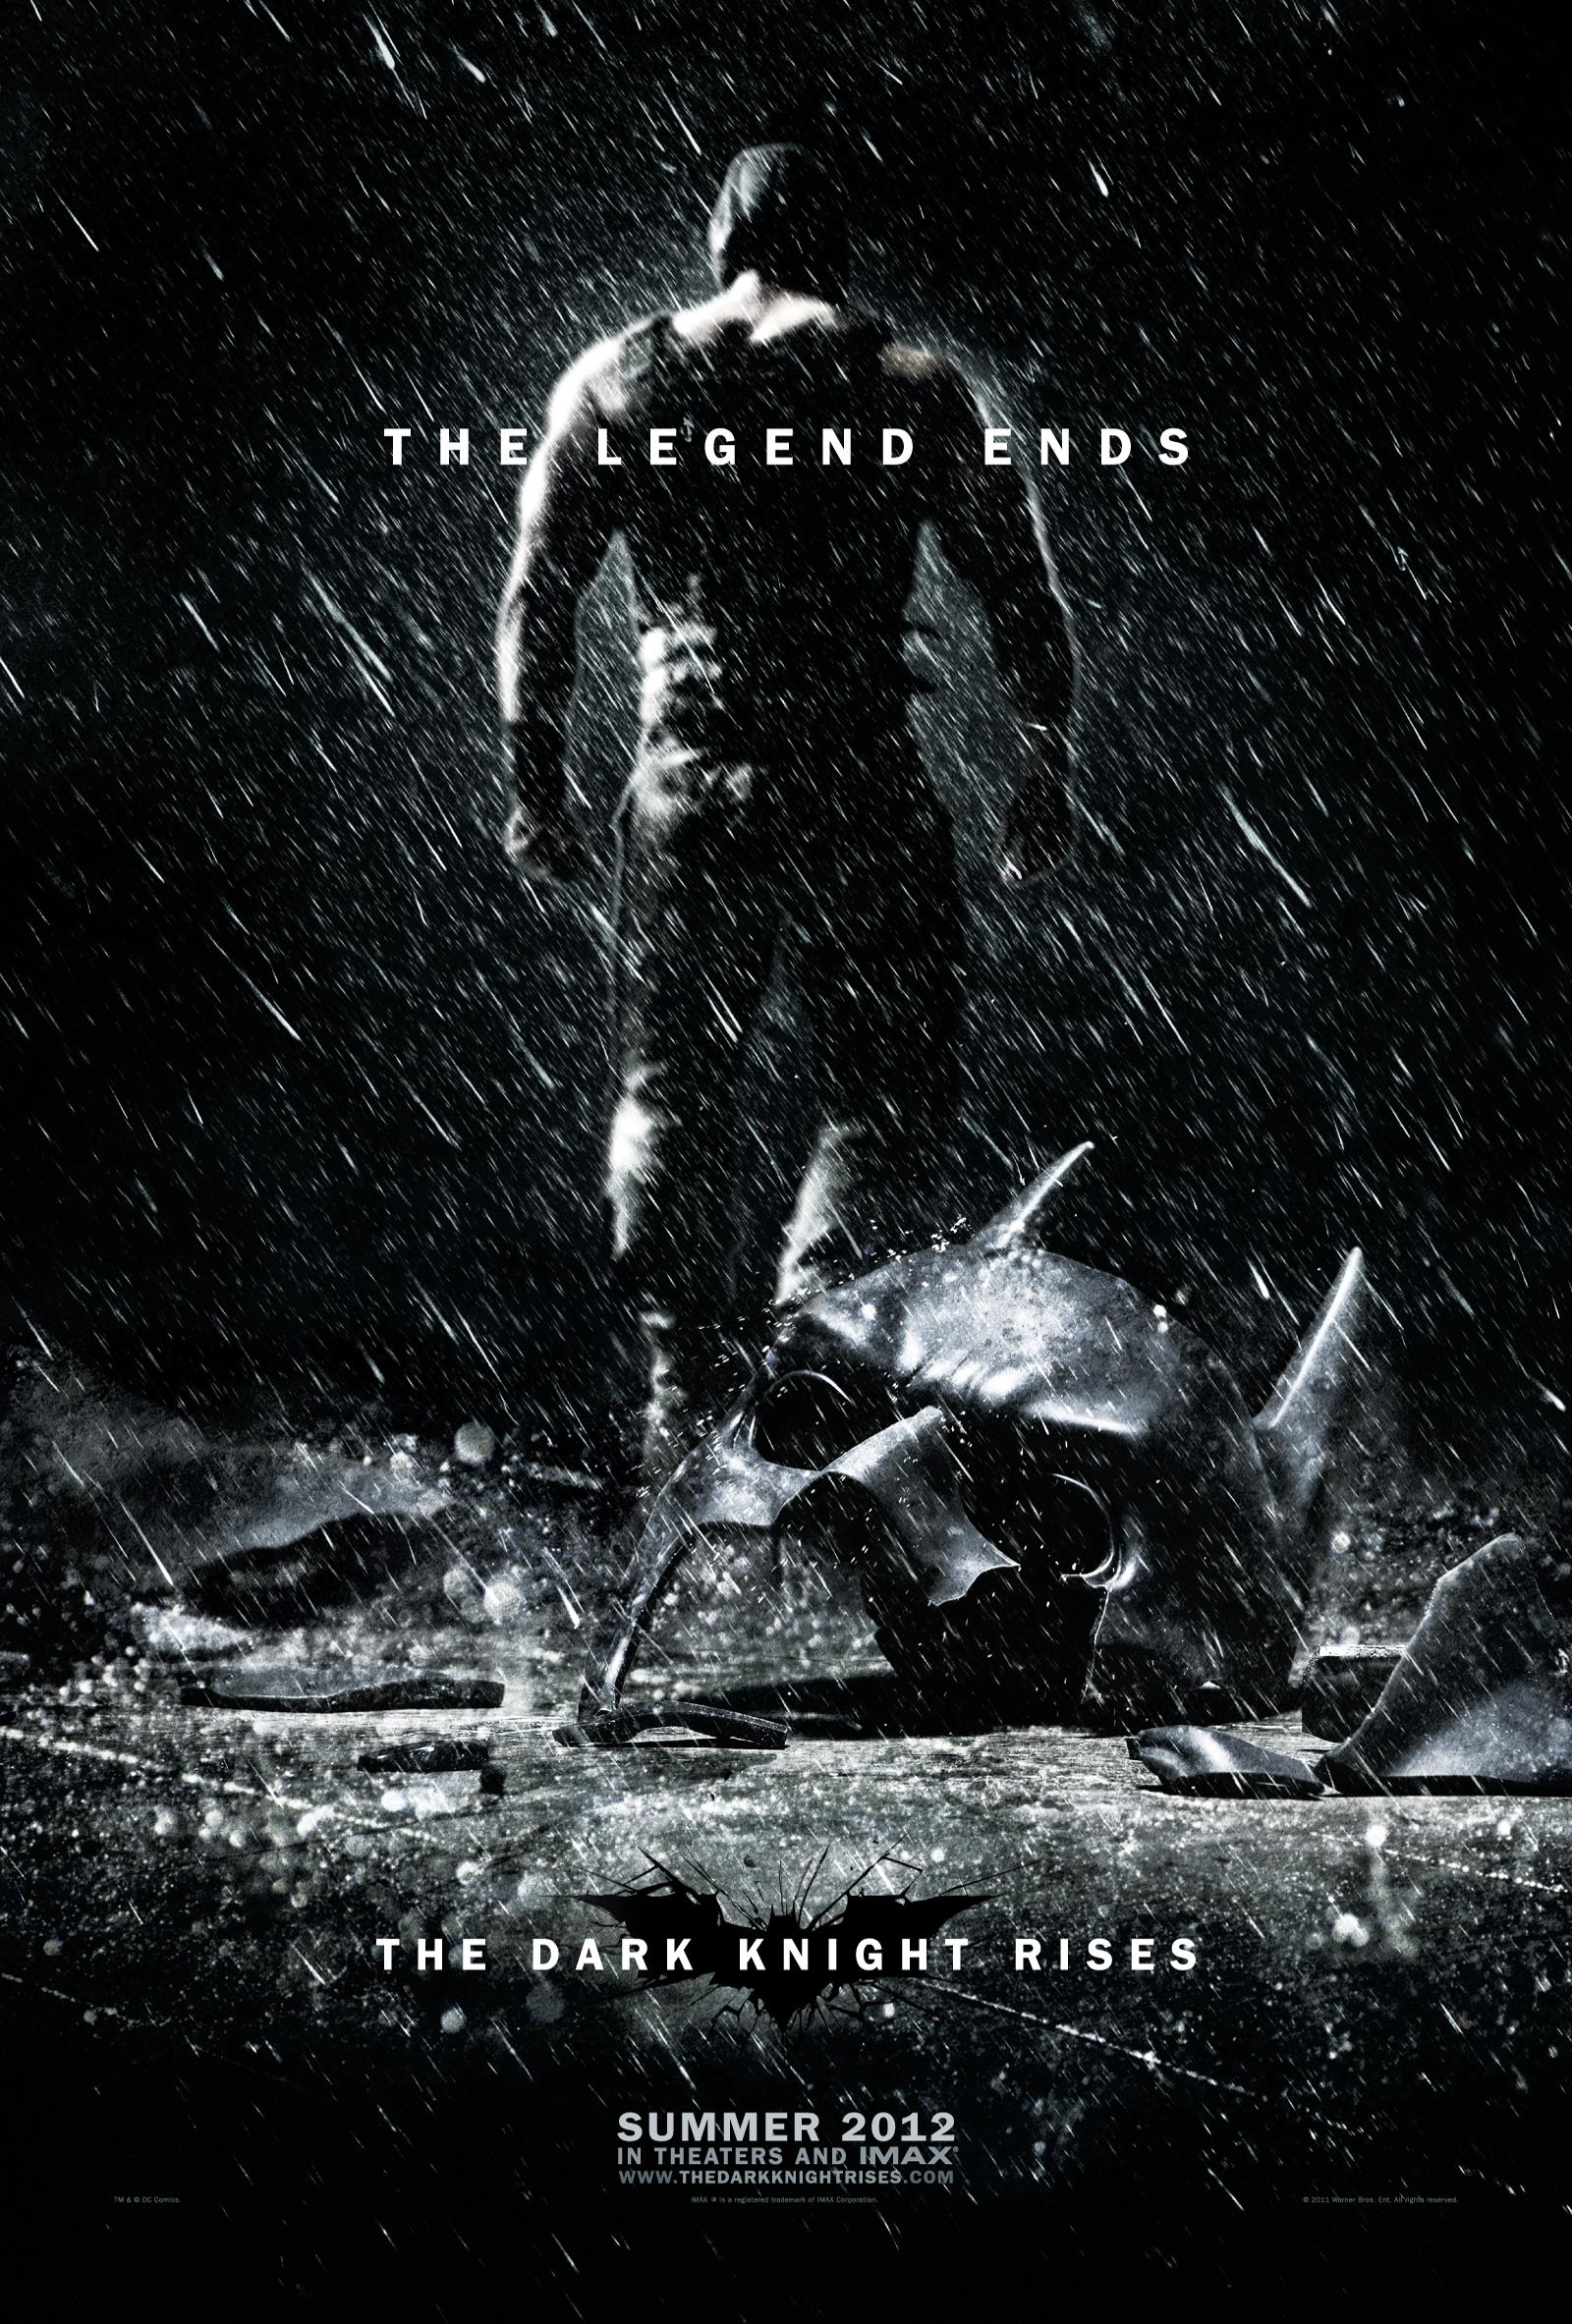 The Dark Knight Rises - Movie Poster #1 (Original)